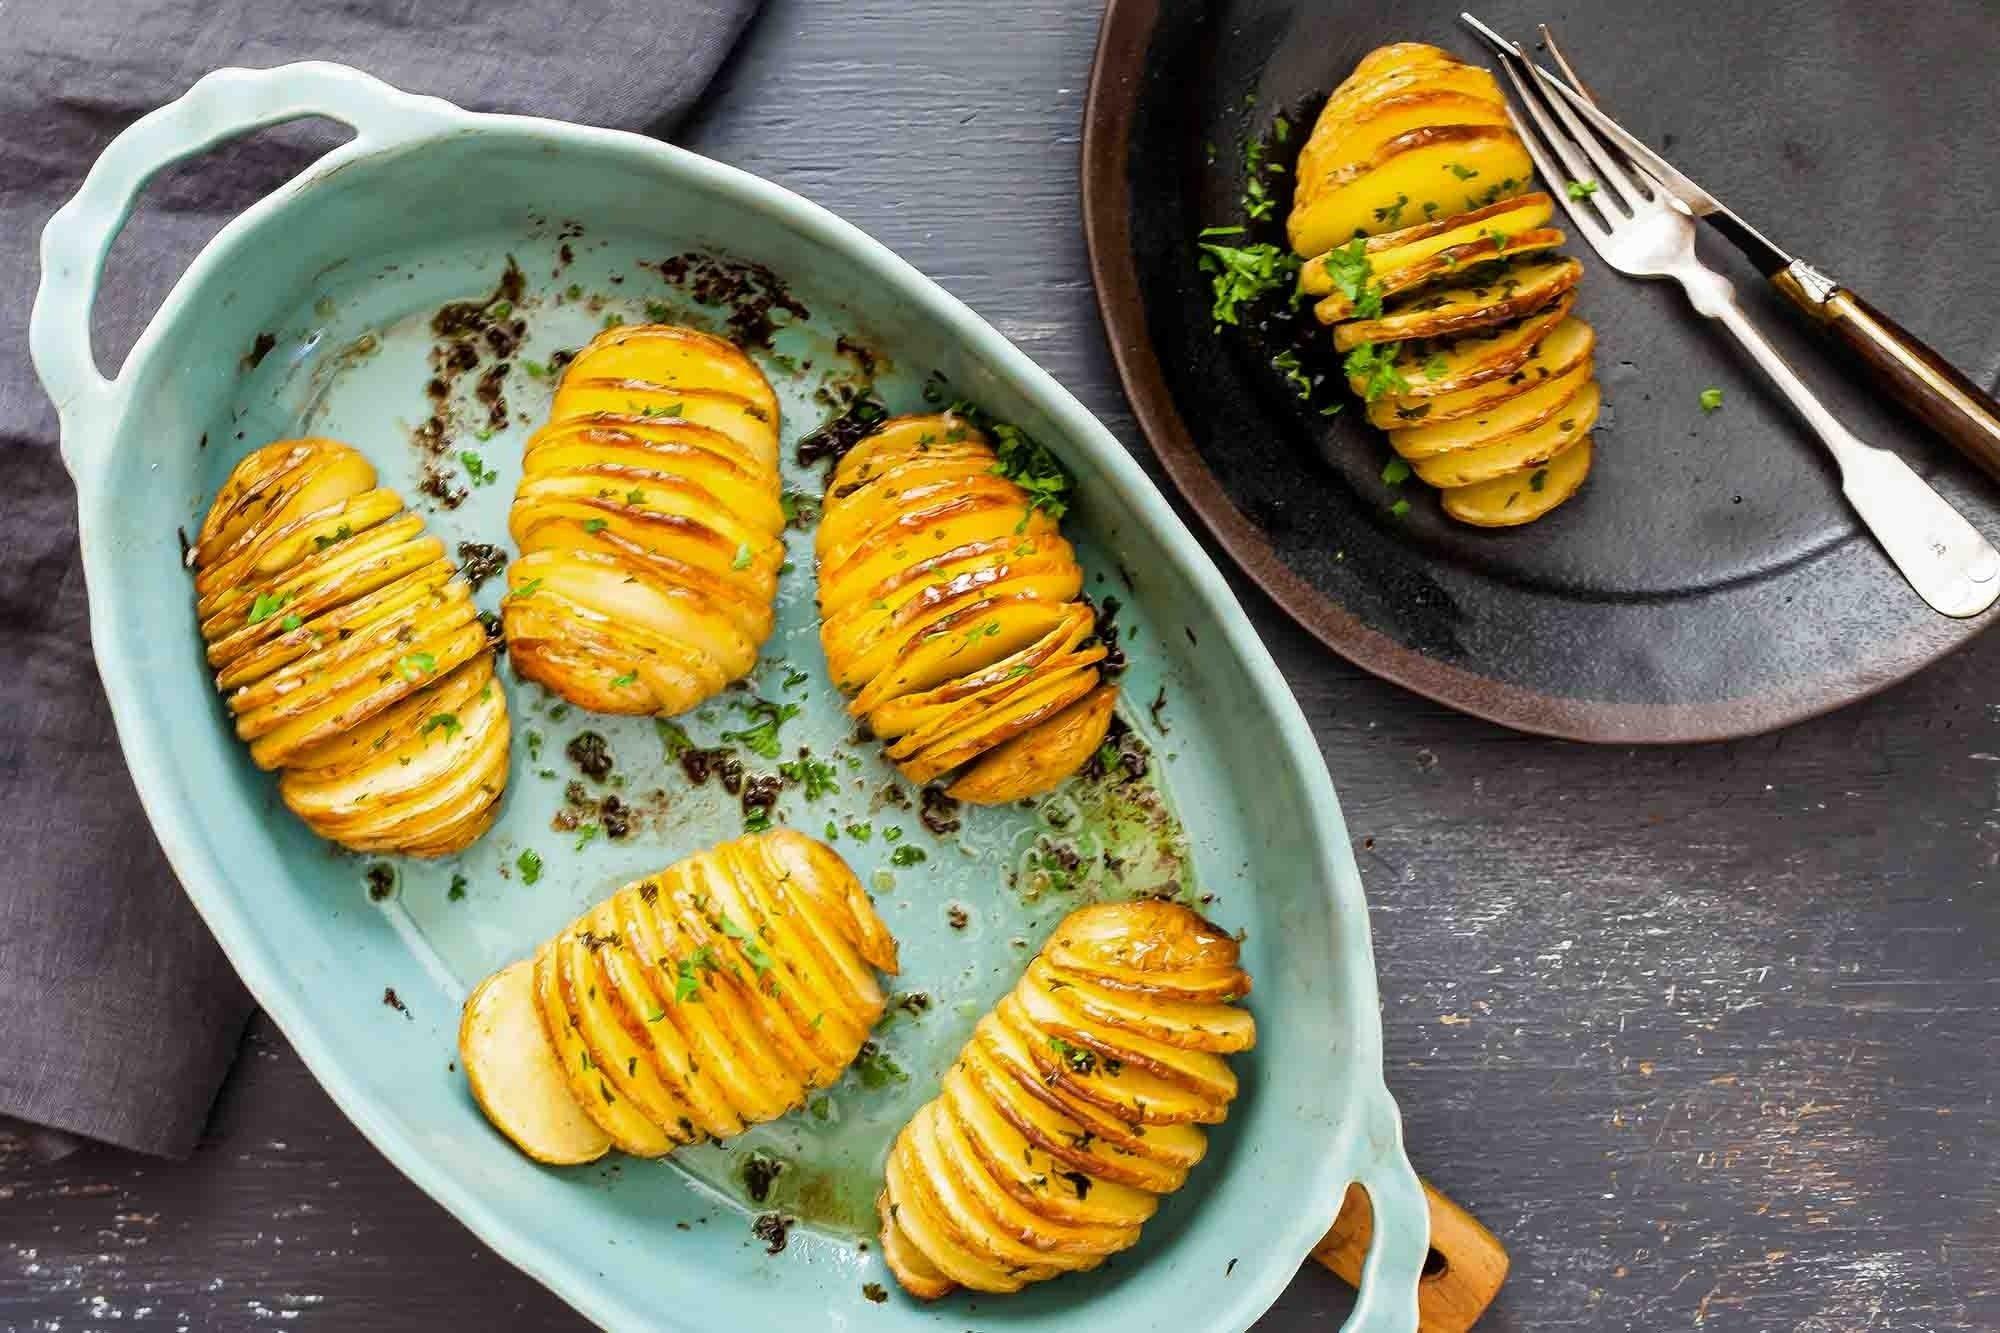 10 Spectacular Prime Rib Side Dishes Ideas crispy hasselback potatoes recipe simplyrecipes 2020